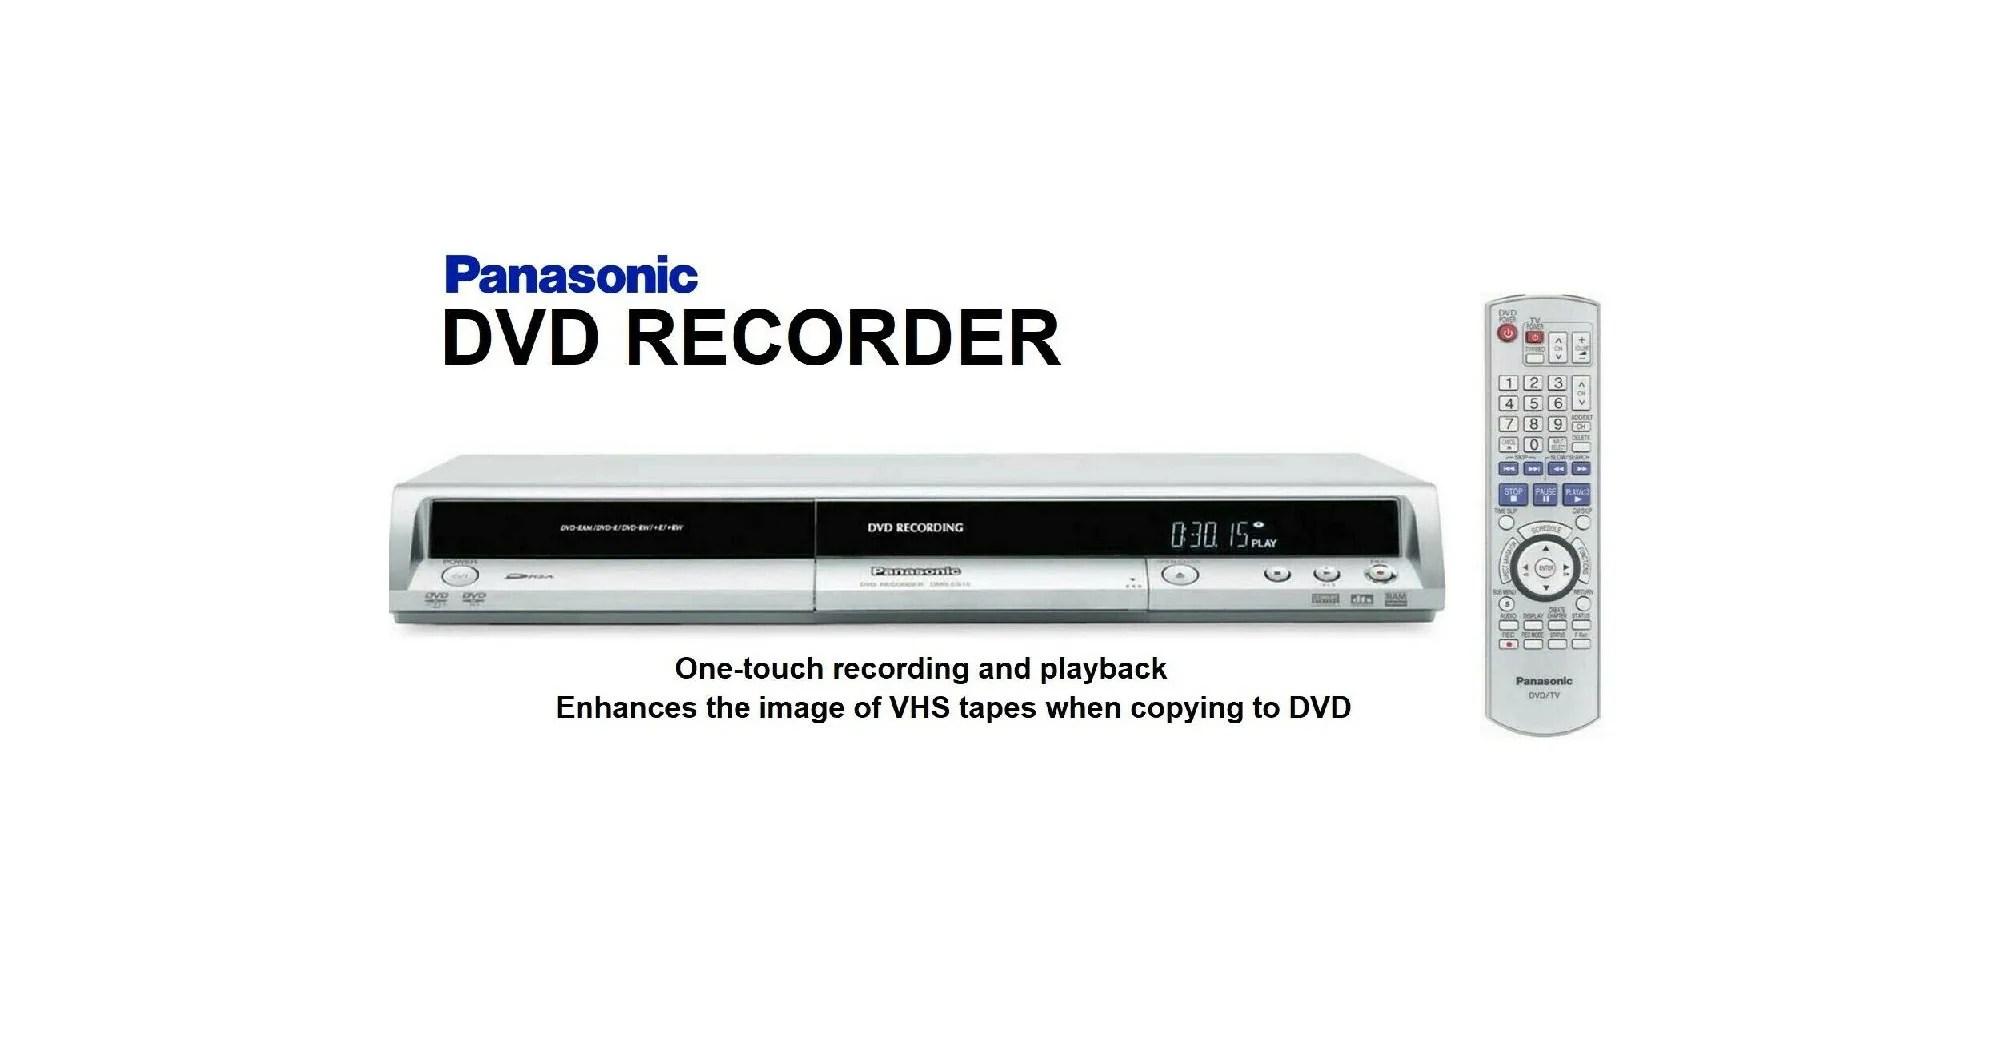 Panasonic DMR-ES15 DVD recorder with digital video output